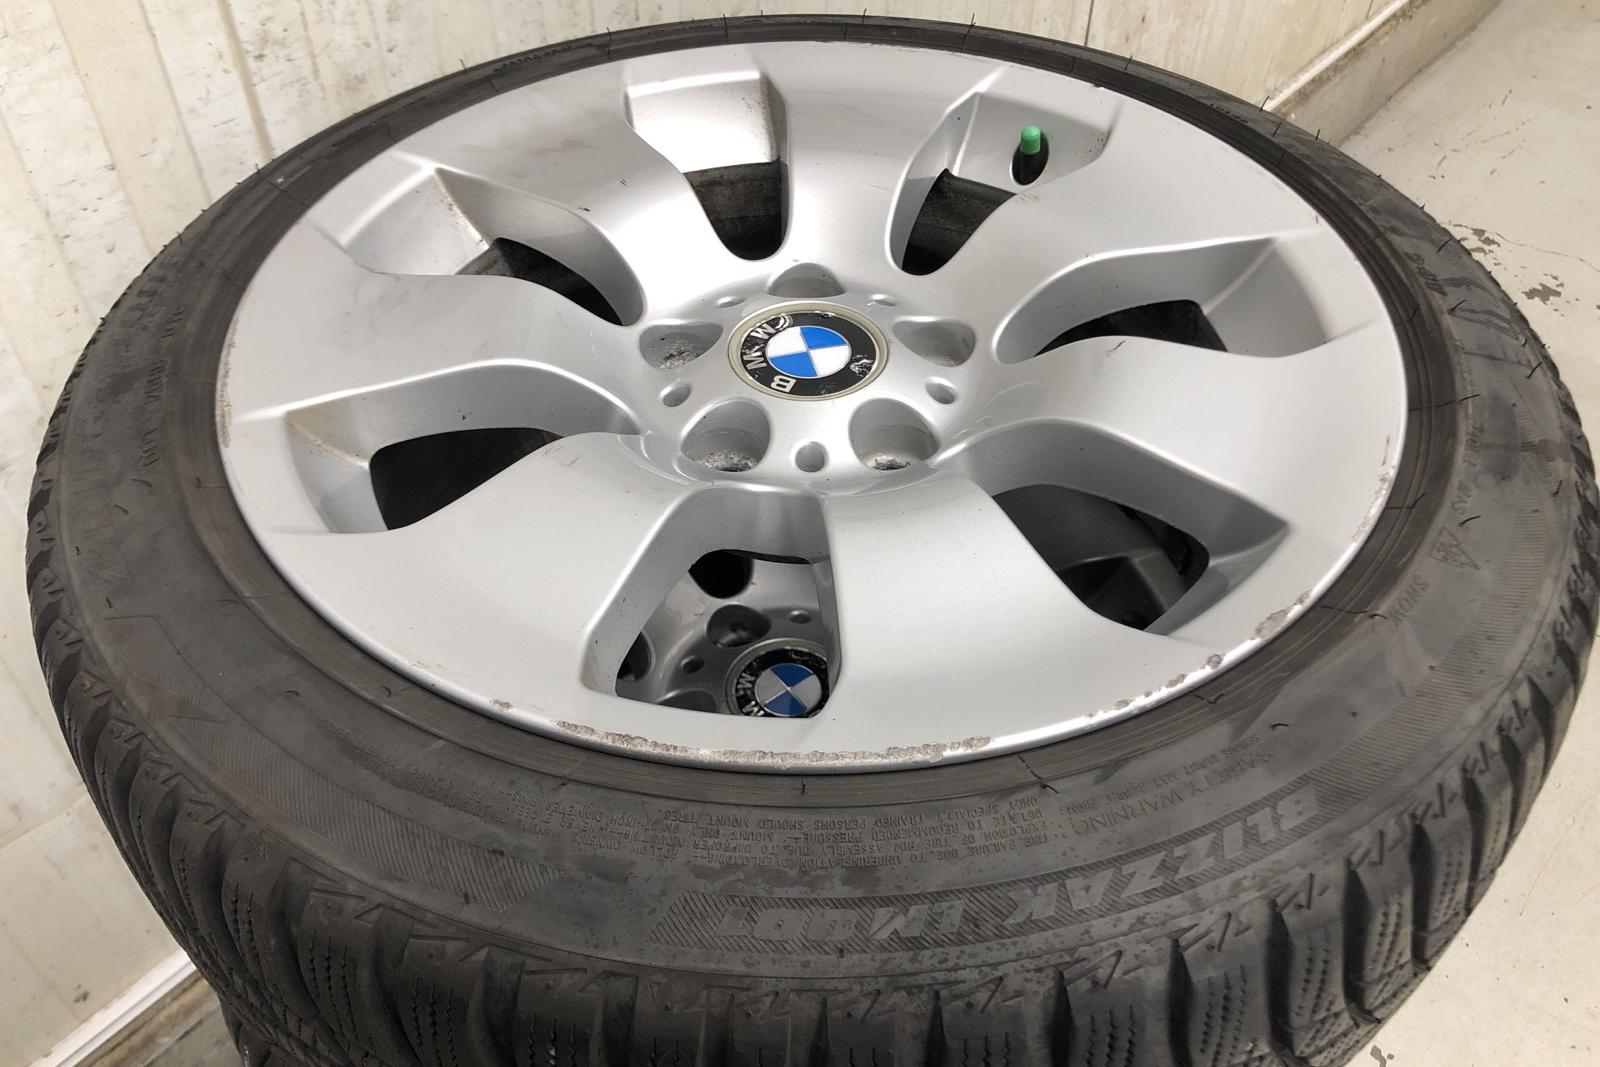 BMW 325i Sedan, E90 (218hk) - 115 770 km - Automatic - white - 2005